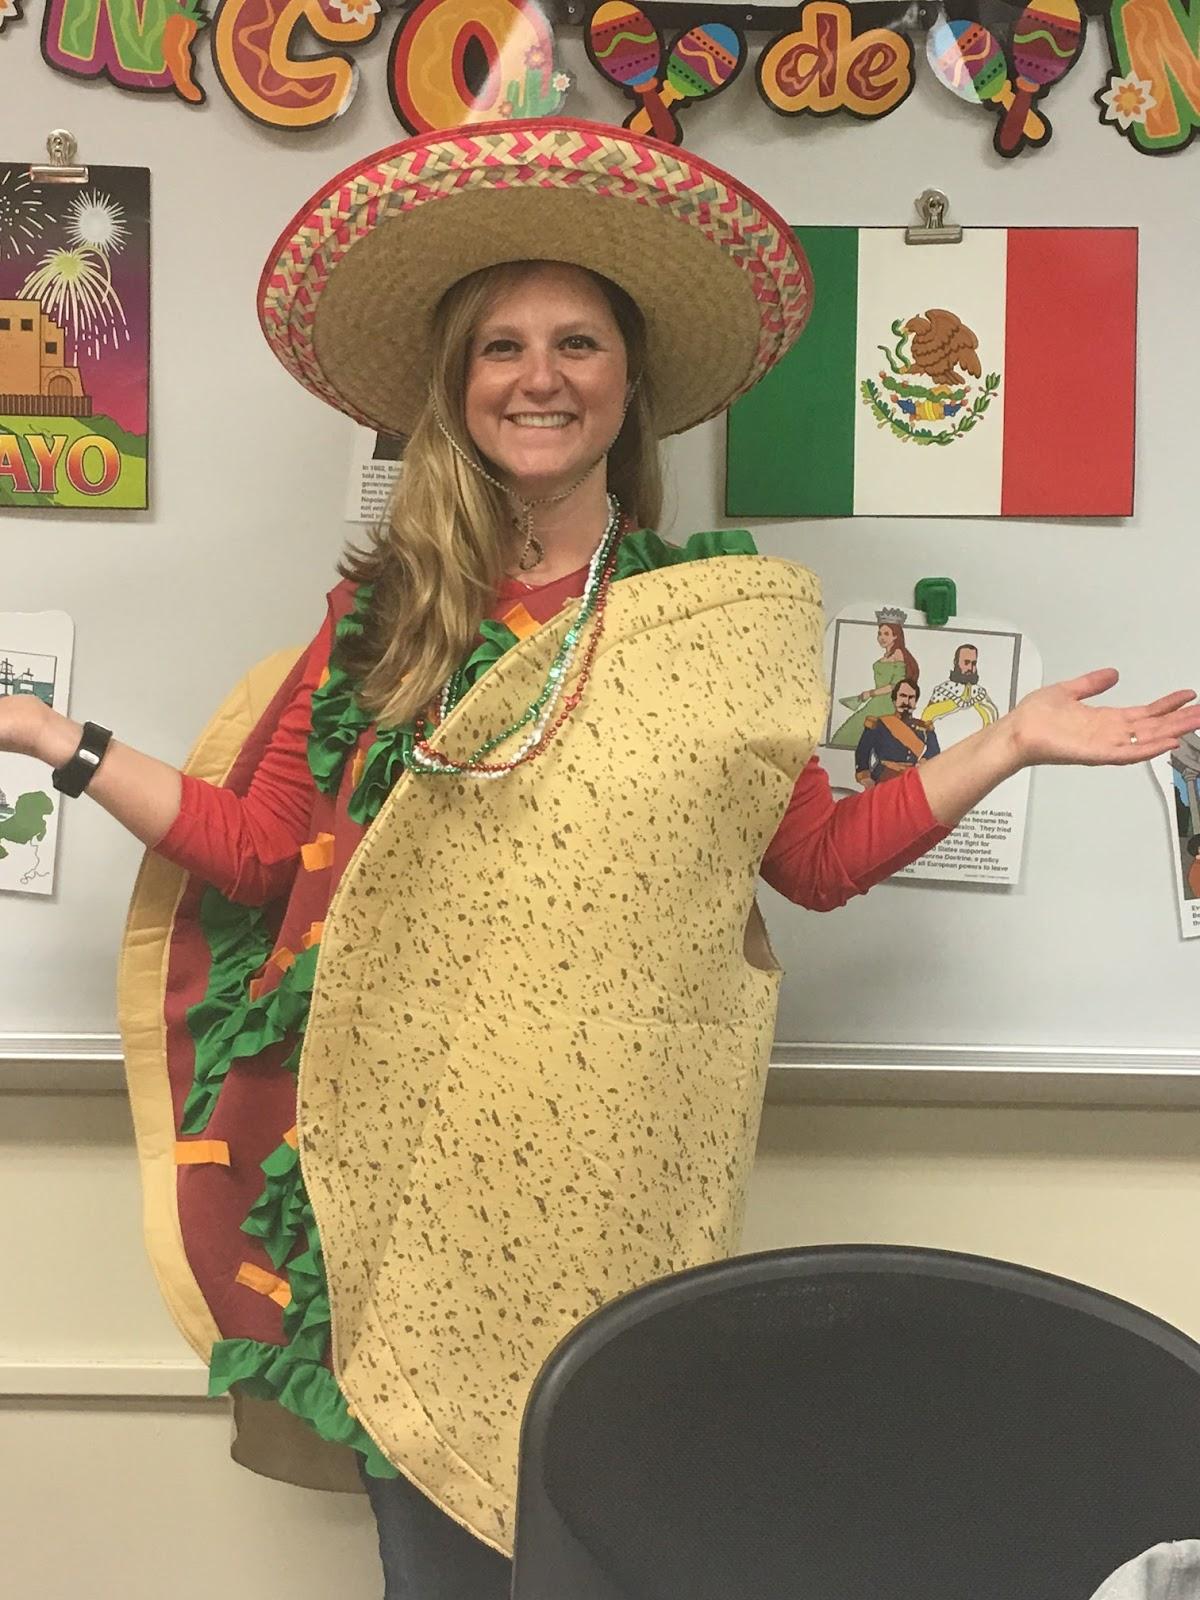 Mrs. Olexenko in a taco costume.